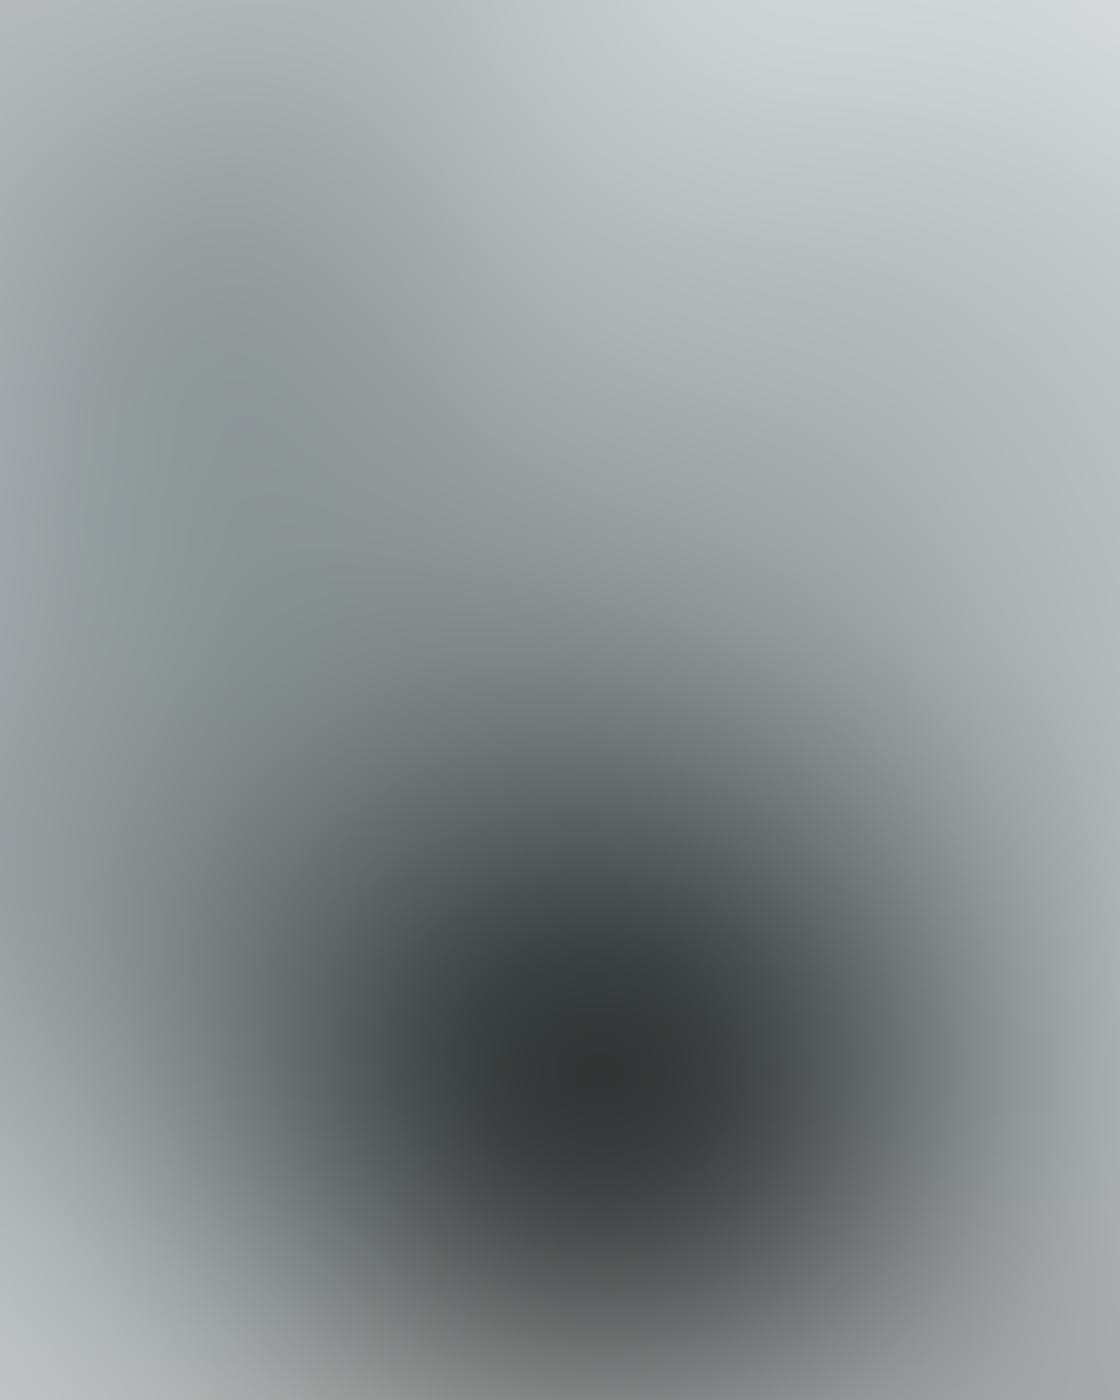 iPhone Photo Perspective 29